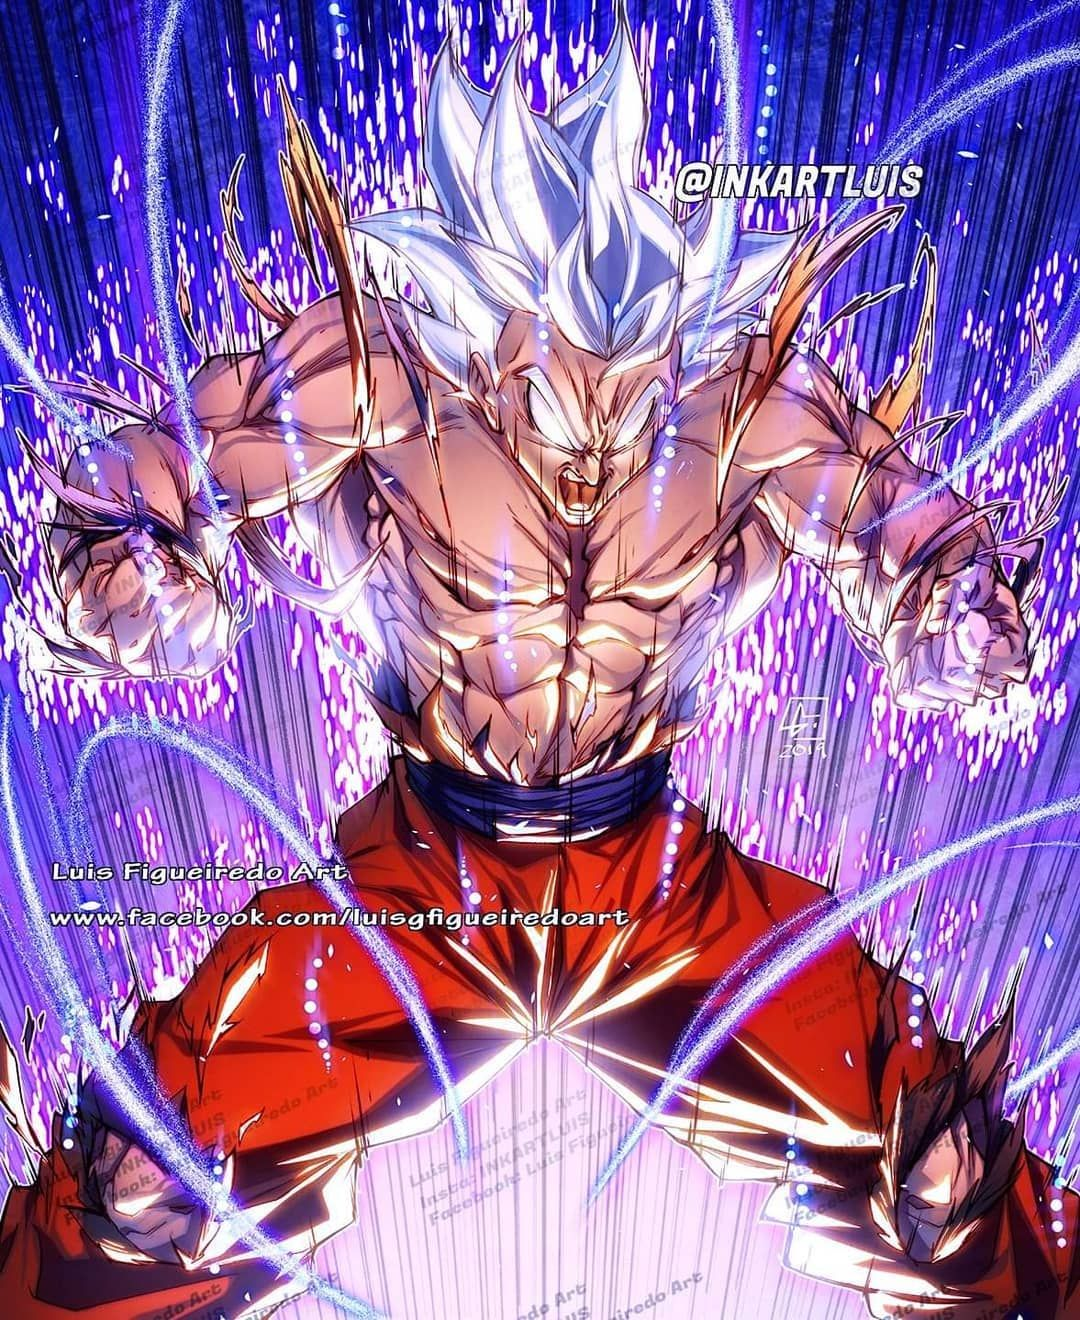 Luis Figueiredo Art On Instagram Goku Mui Transformation Who Is Ur Fav Saiyan Transformation E Dragon Ball Art Dragon Ball Super Goku Anime Character Design